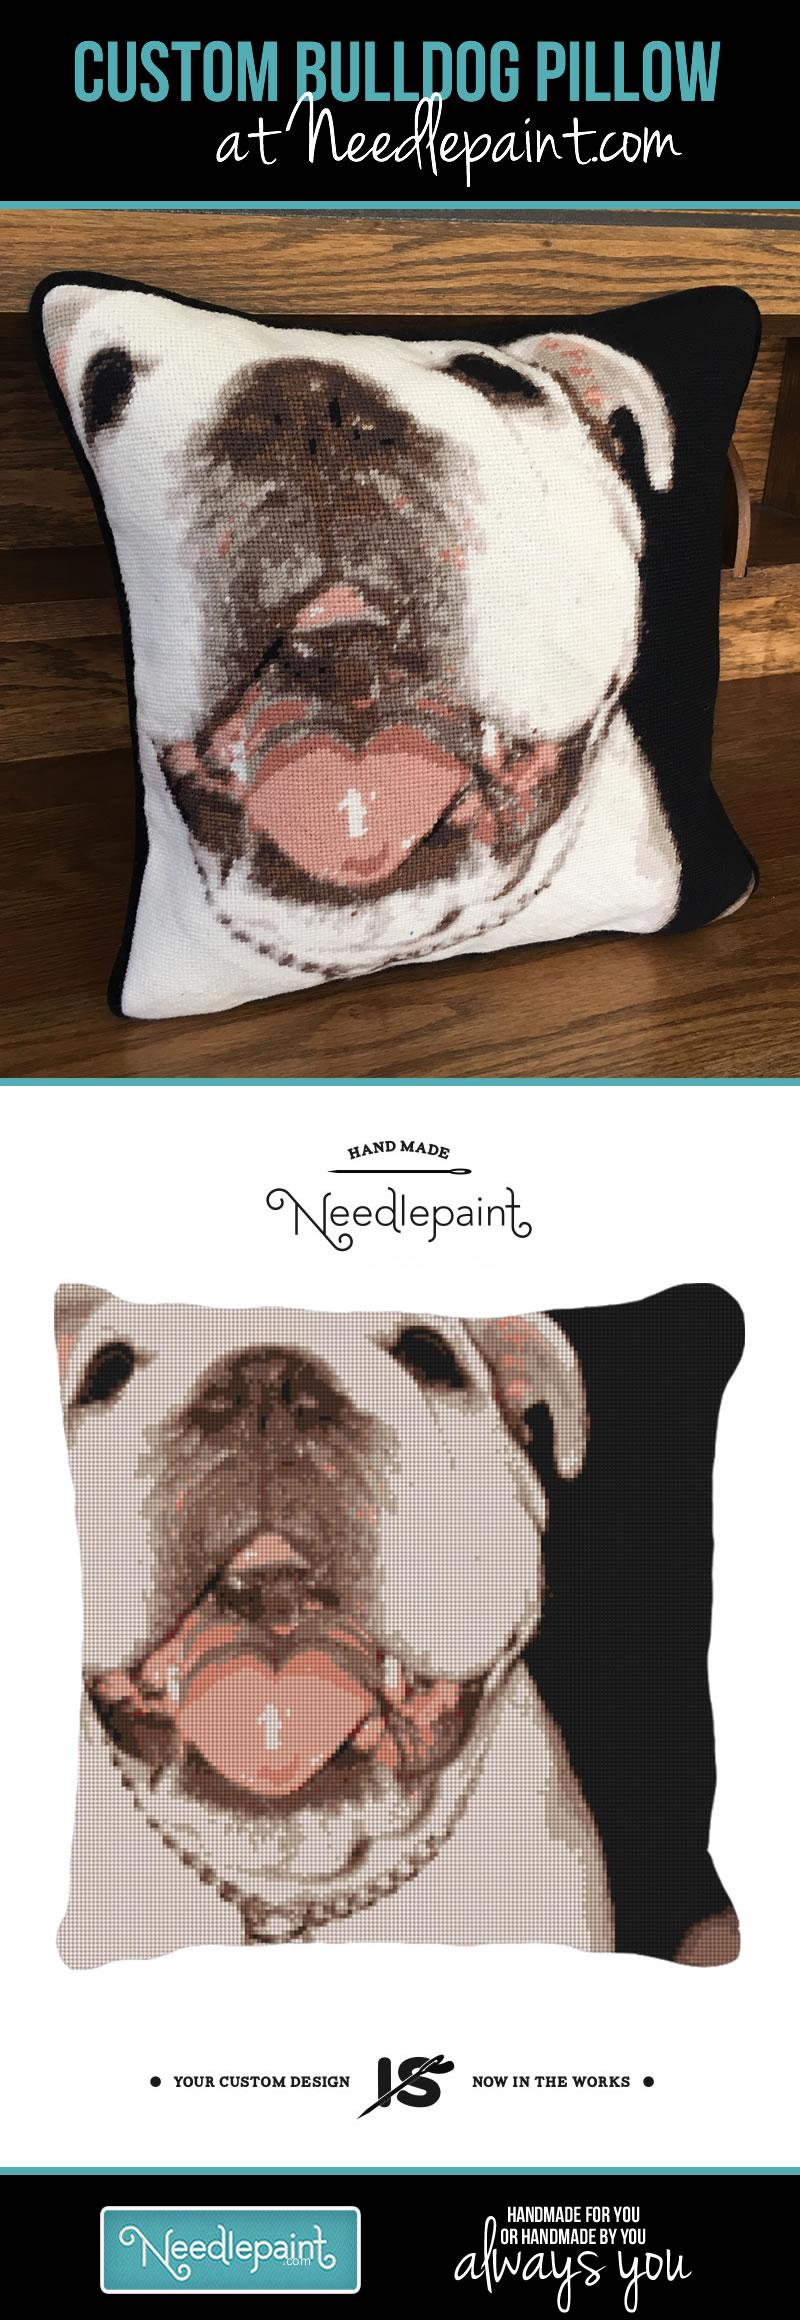 Custom Bulldog Needlepoint Pillow